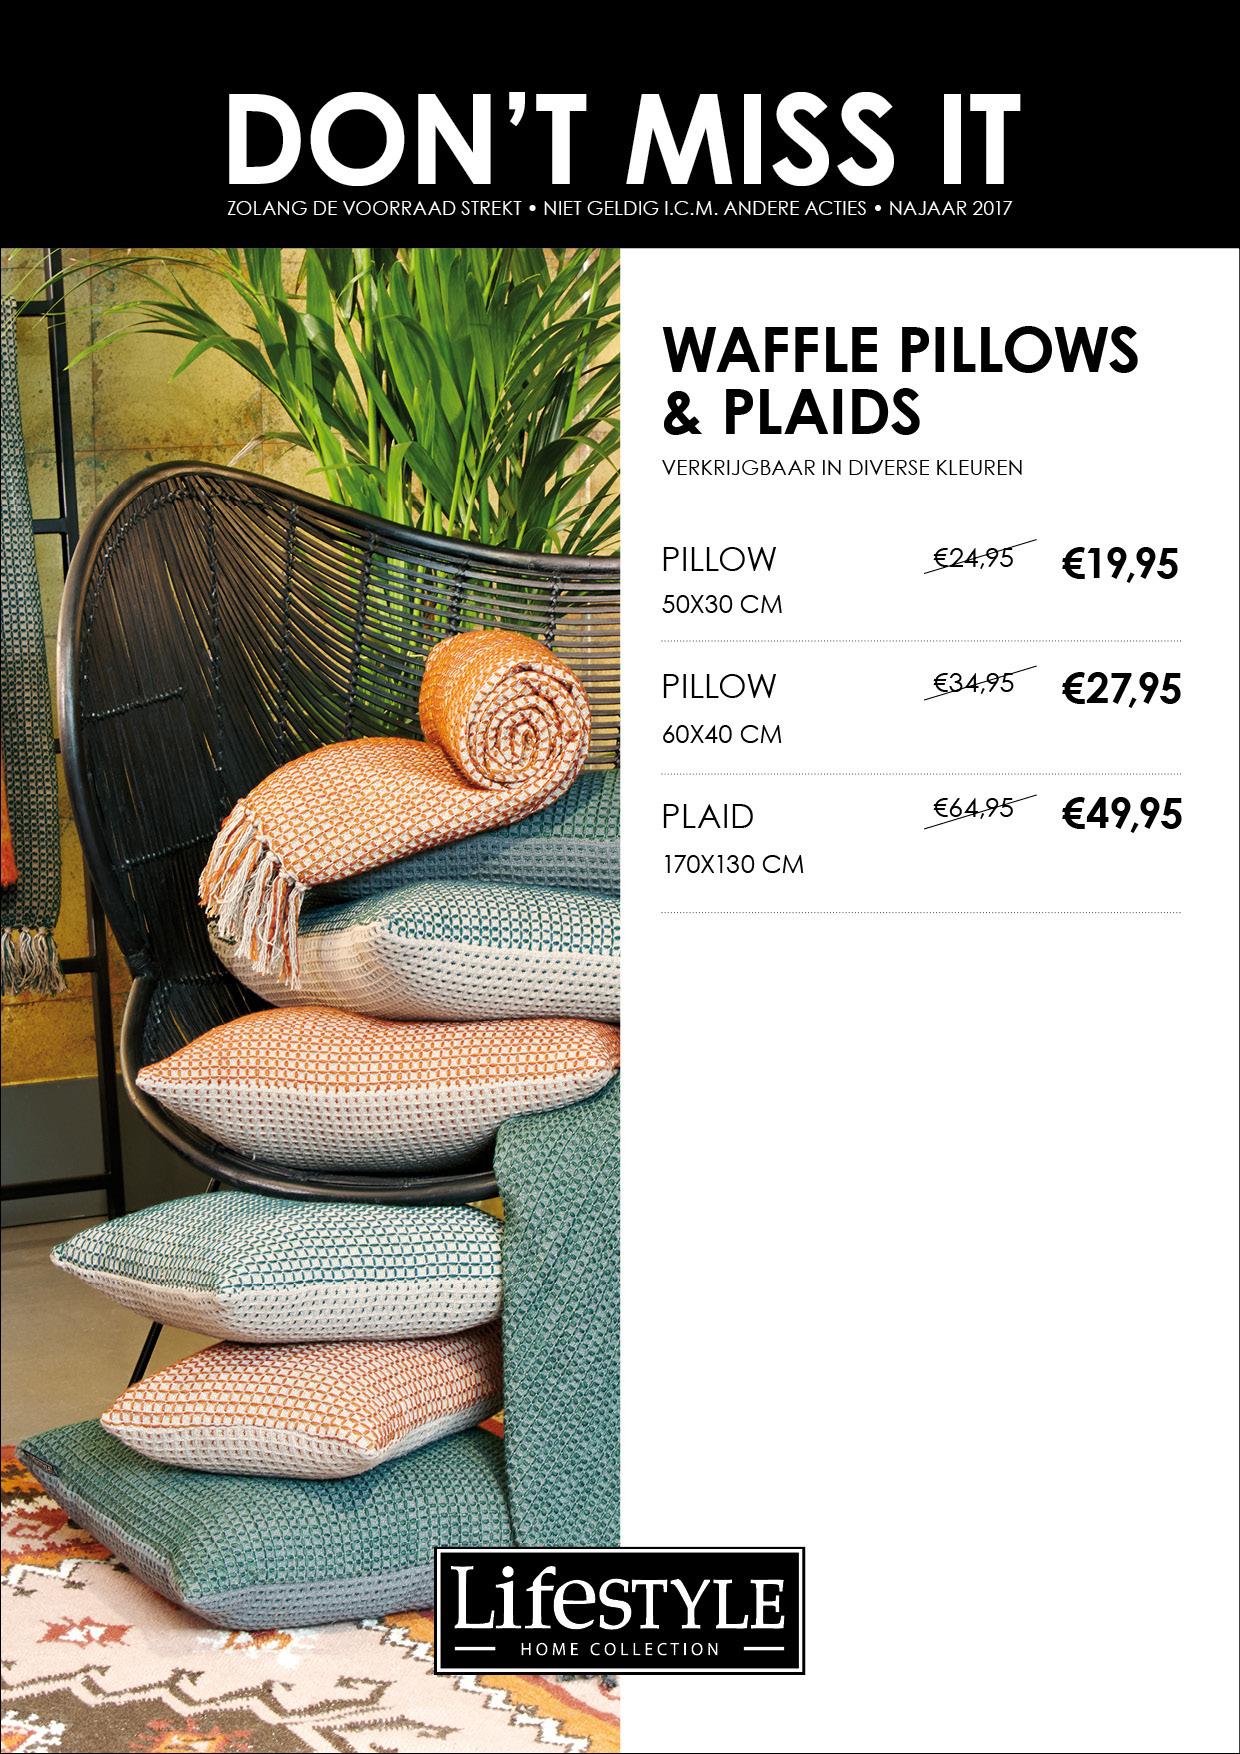 aanbiedingen lifestyle home collection. Black Bedroom Furniture Sets. Home Design Ideas